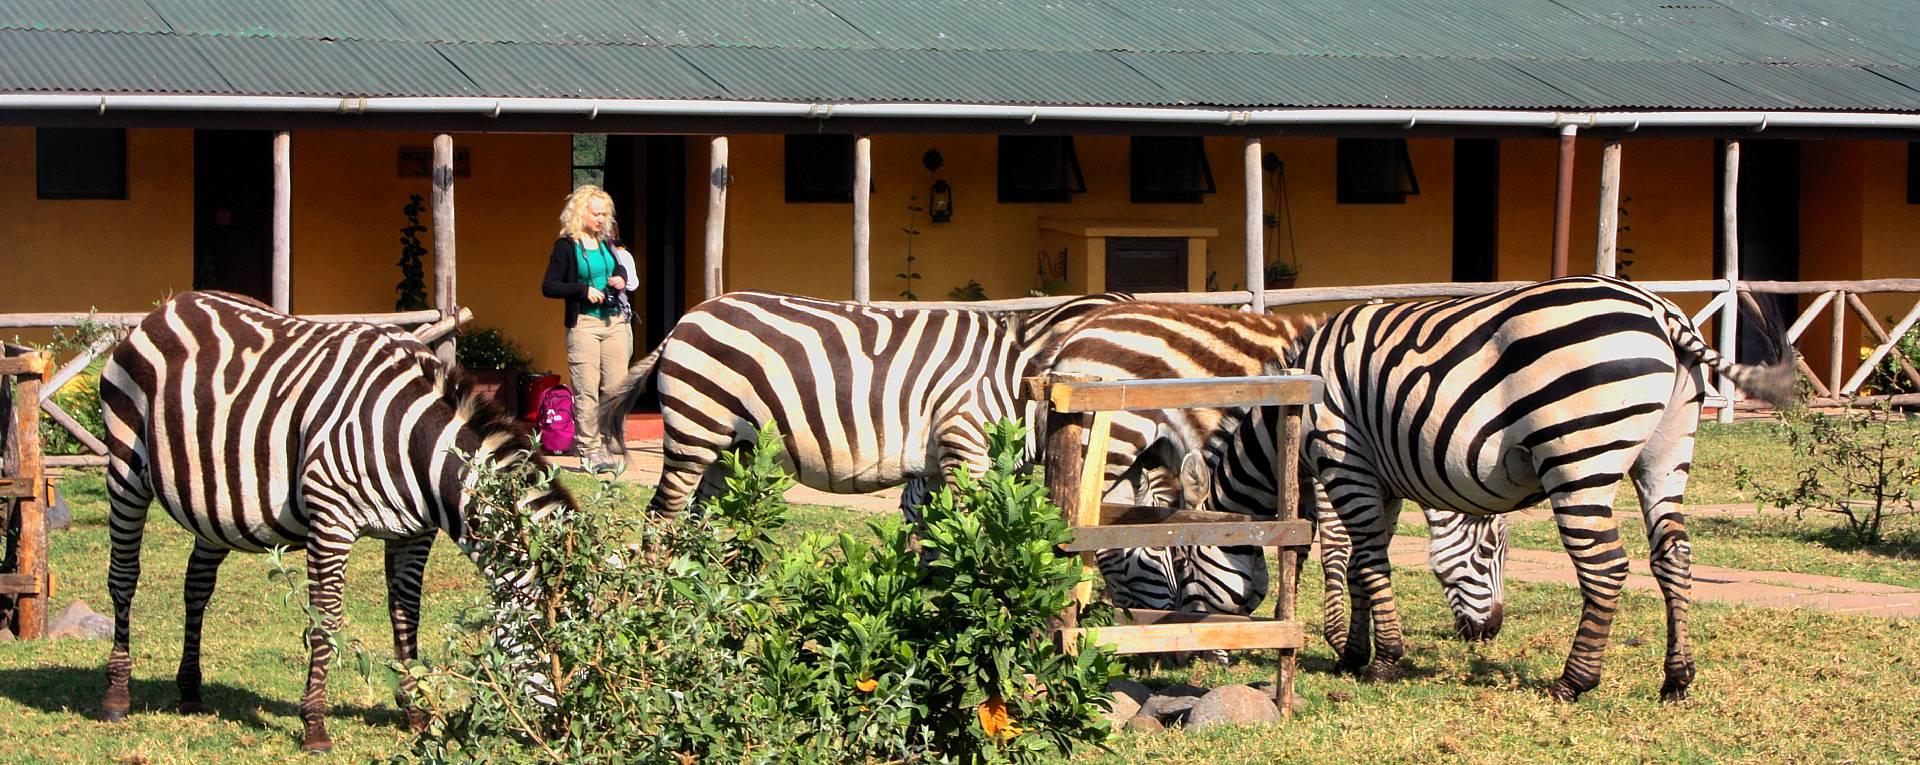 Ngorongoro Rhino Lodge Zebras